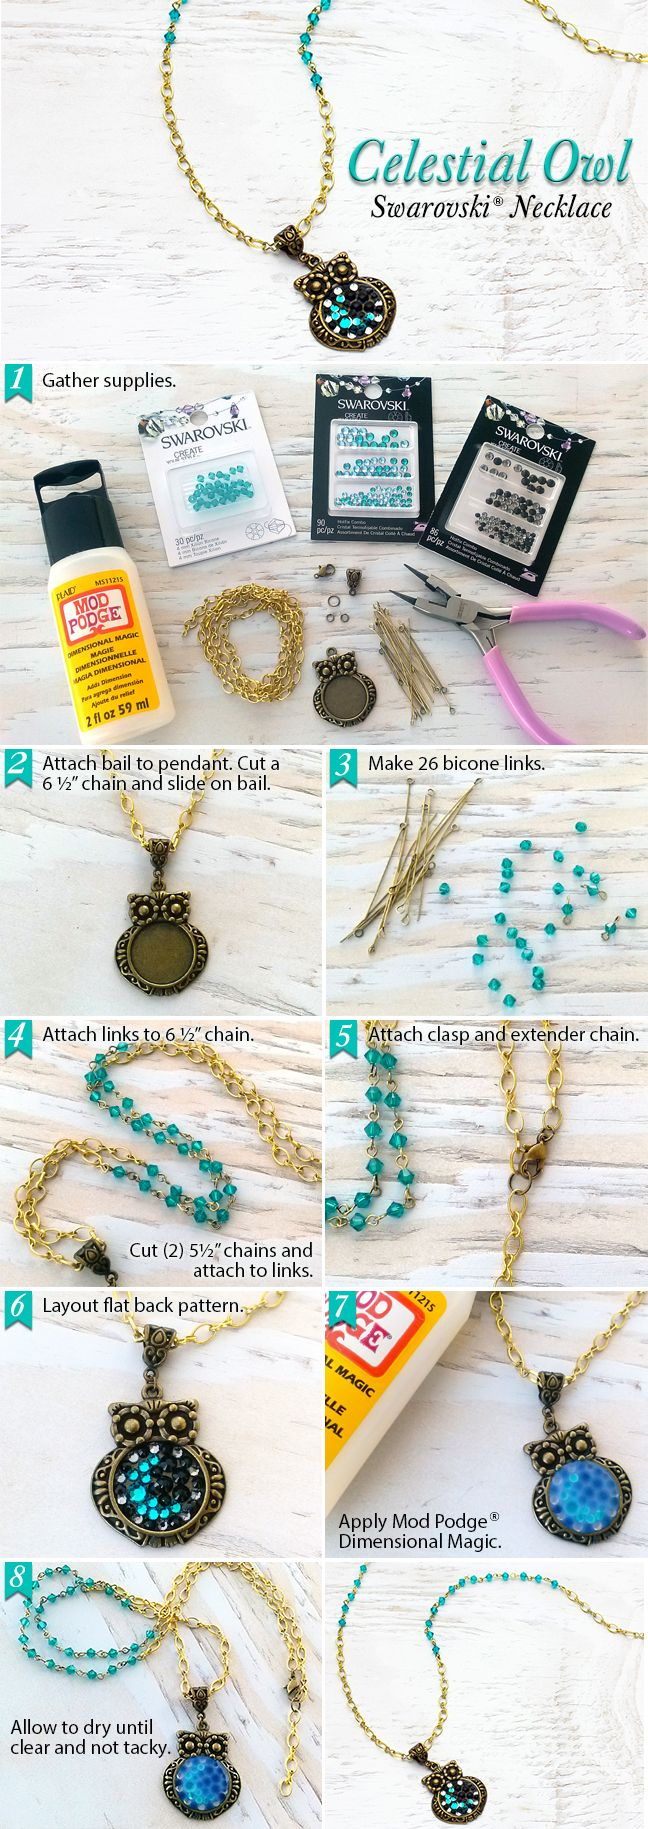 DIY Swarovski Celestial Owl Pendant Necklace